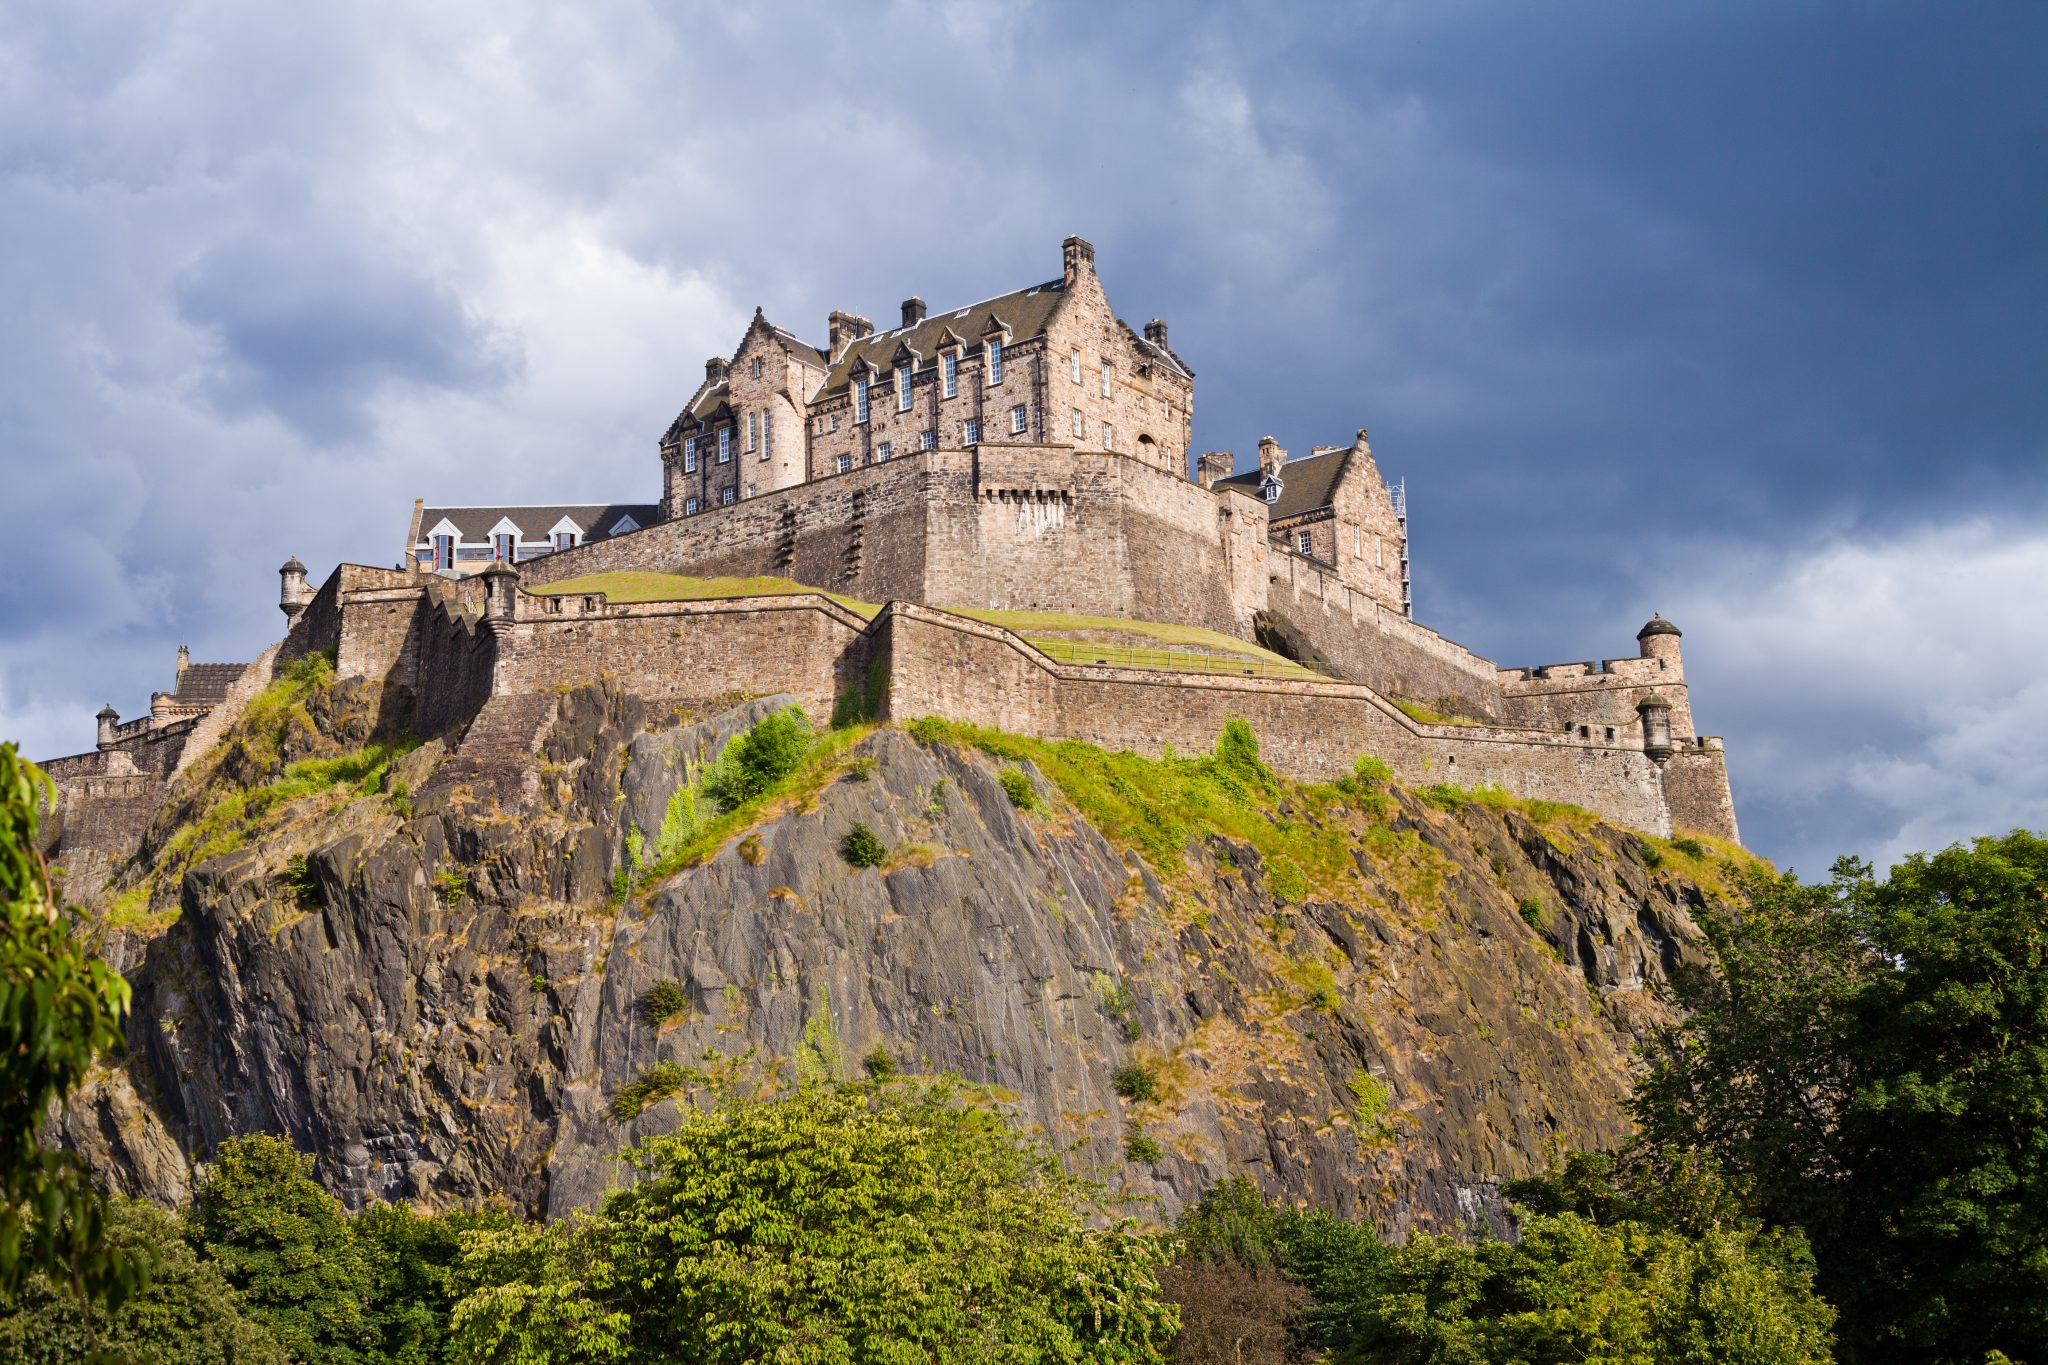 Channel 5 lifts the kilt on Scotland's hidden treasures – TBI Vision